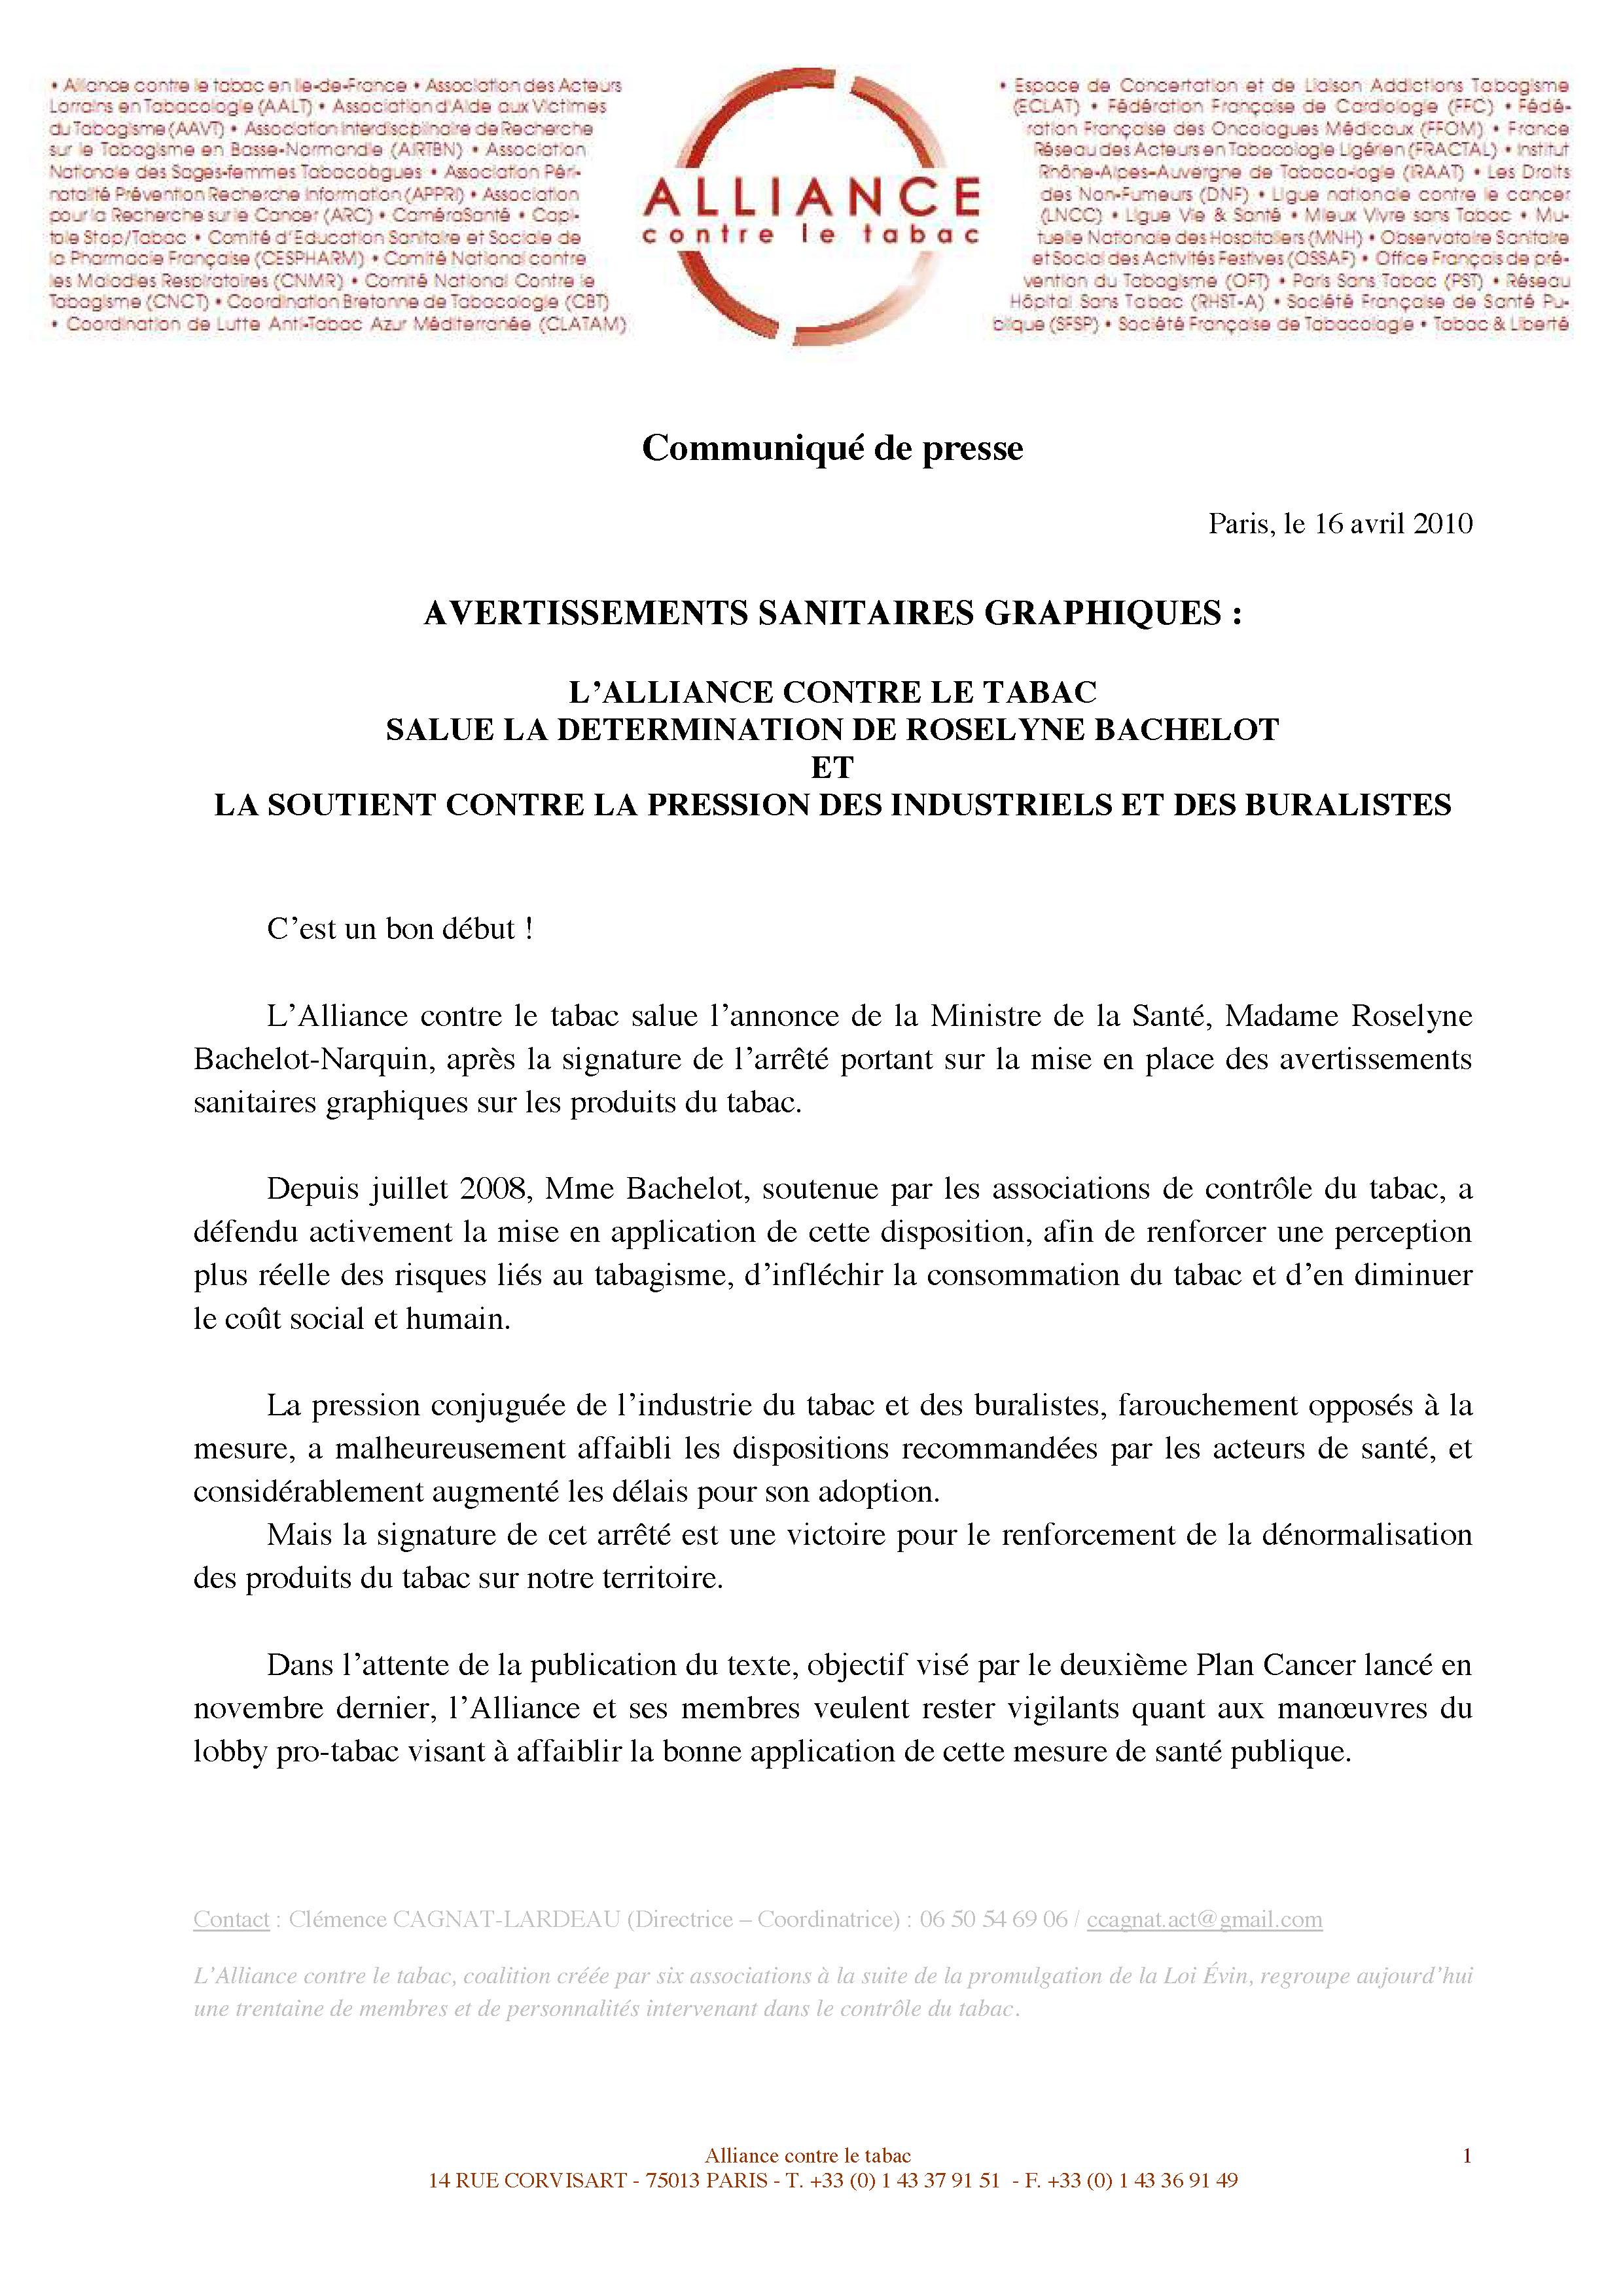 Alliance-CP_avertissements-sanitaires-graphiques-16avr2010.jpg